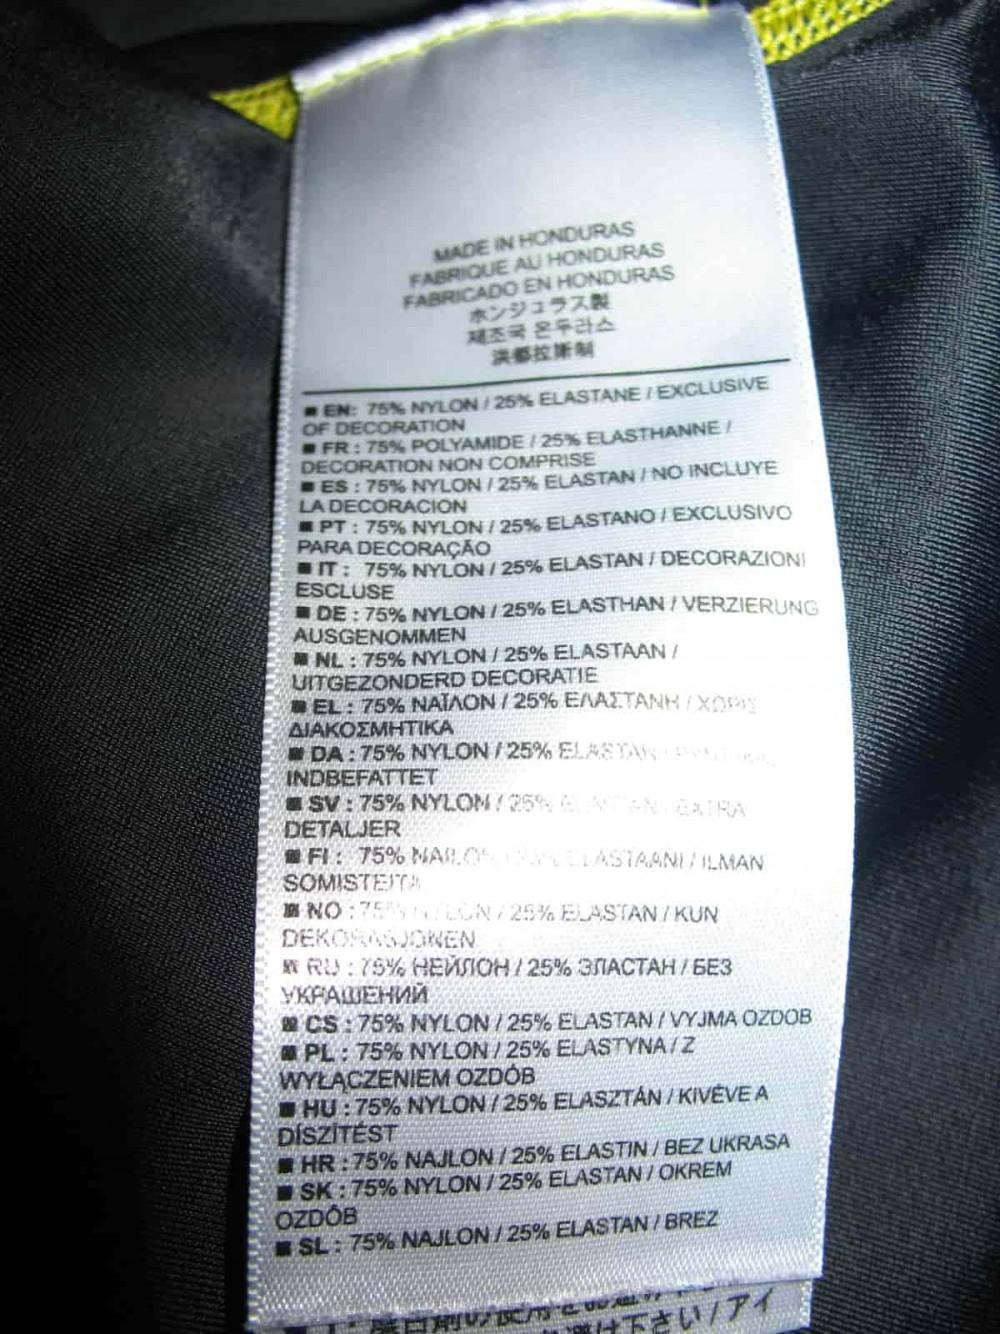 Футболка+брюки SKINS A200  short sleeves jersey+ long tights (размер M) - 7